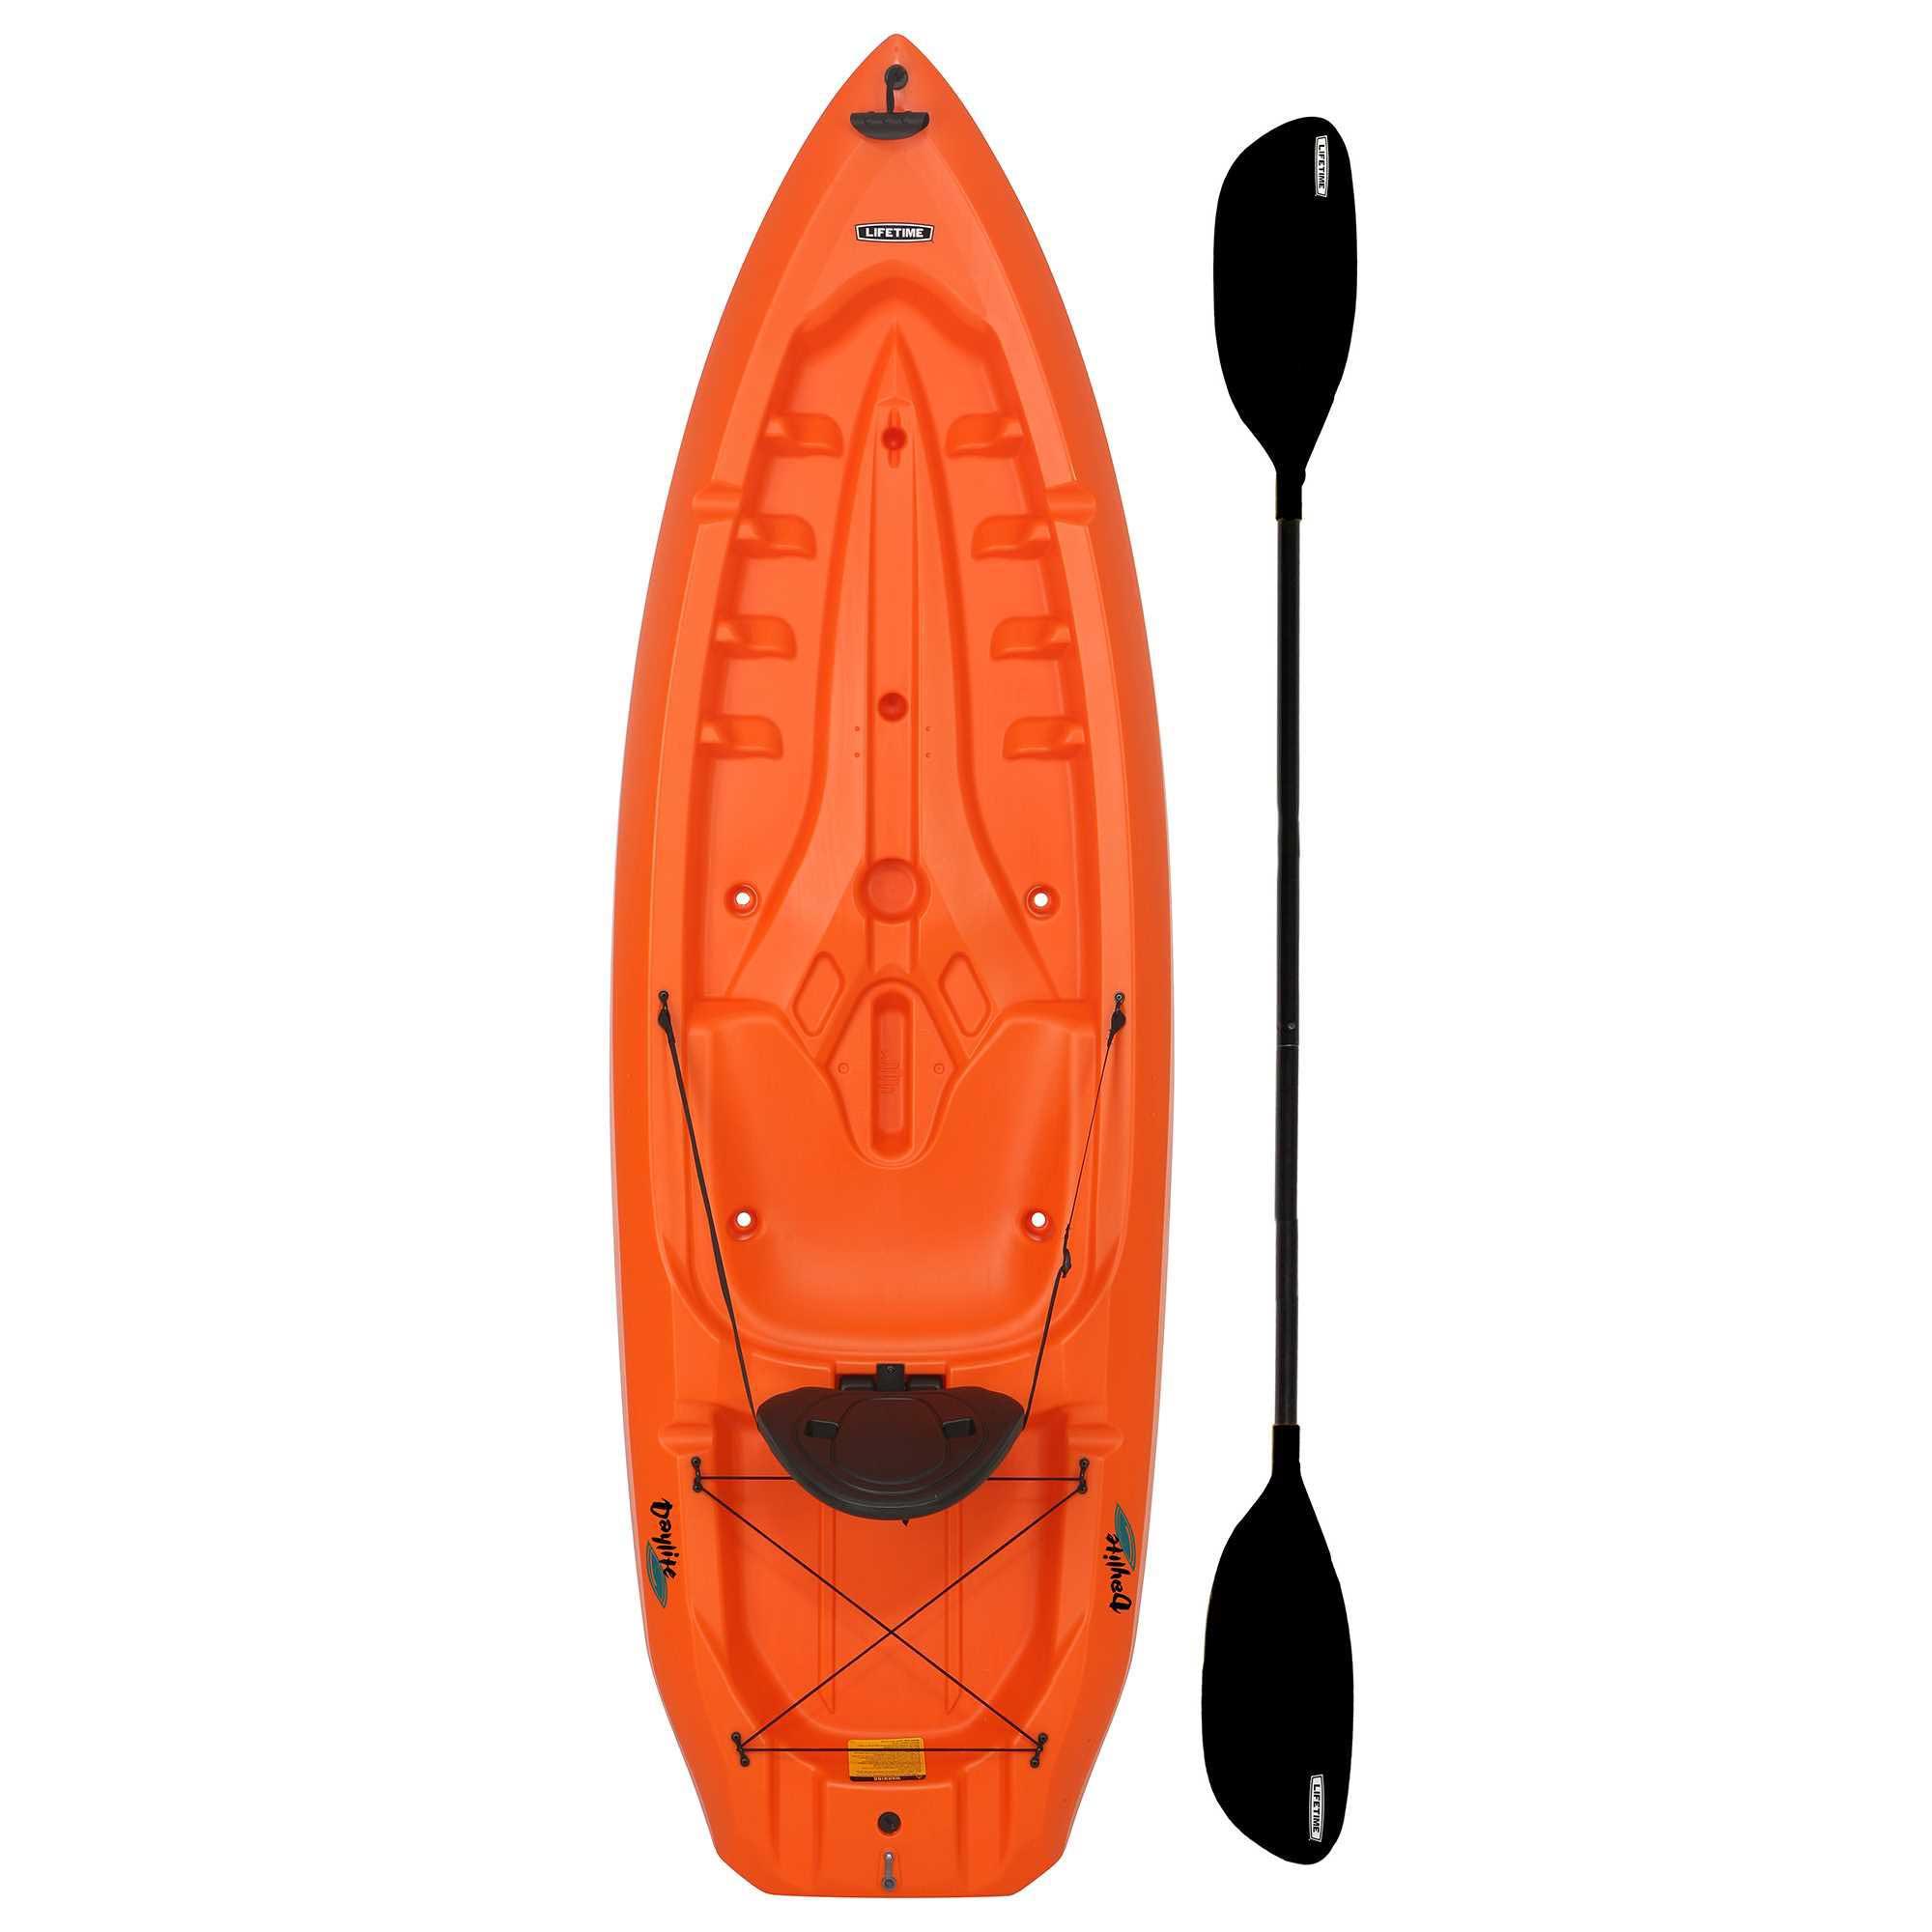 Play > Kayaks and Paddle Boards > Lotus > Lifetime Daylite Kayak